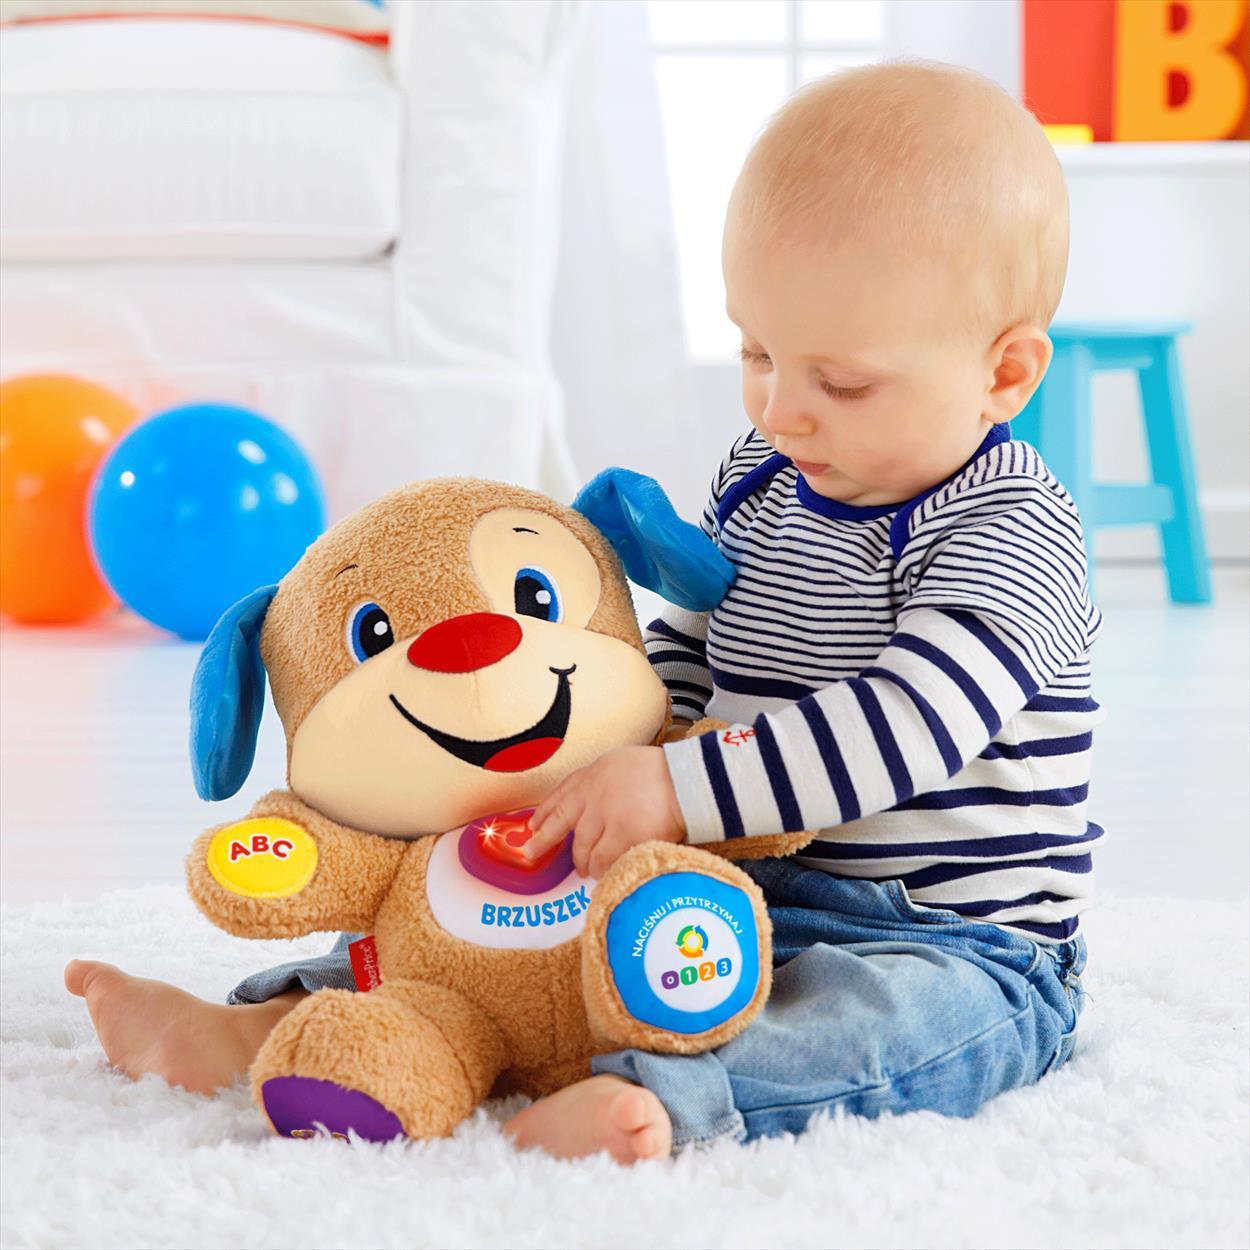 cjv64-smart-stages-puppy-pl-d-1_h1250